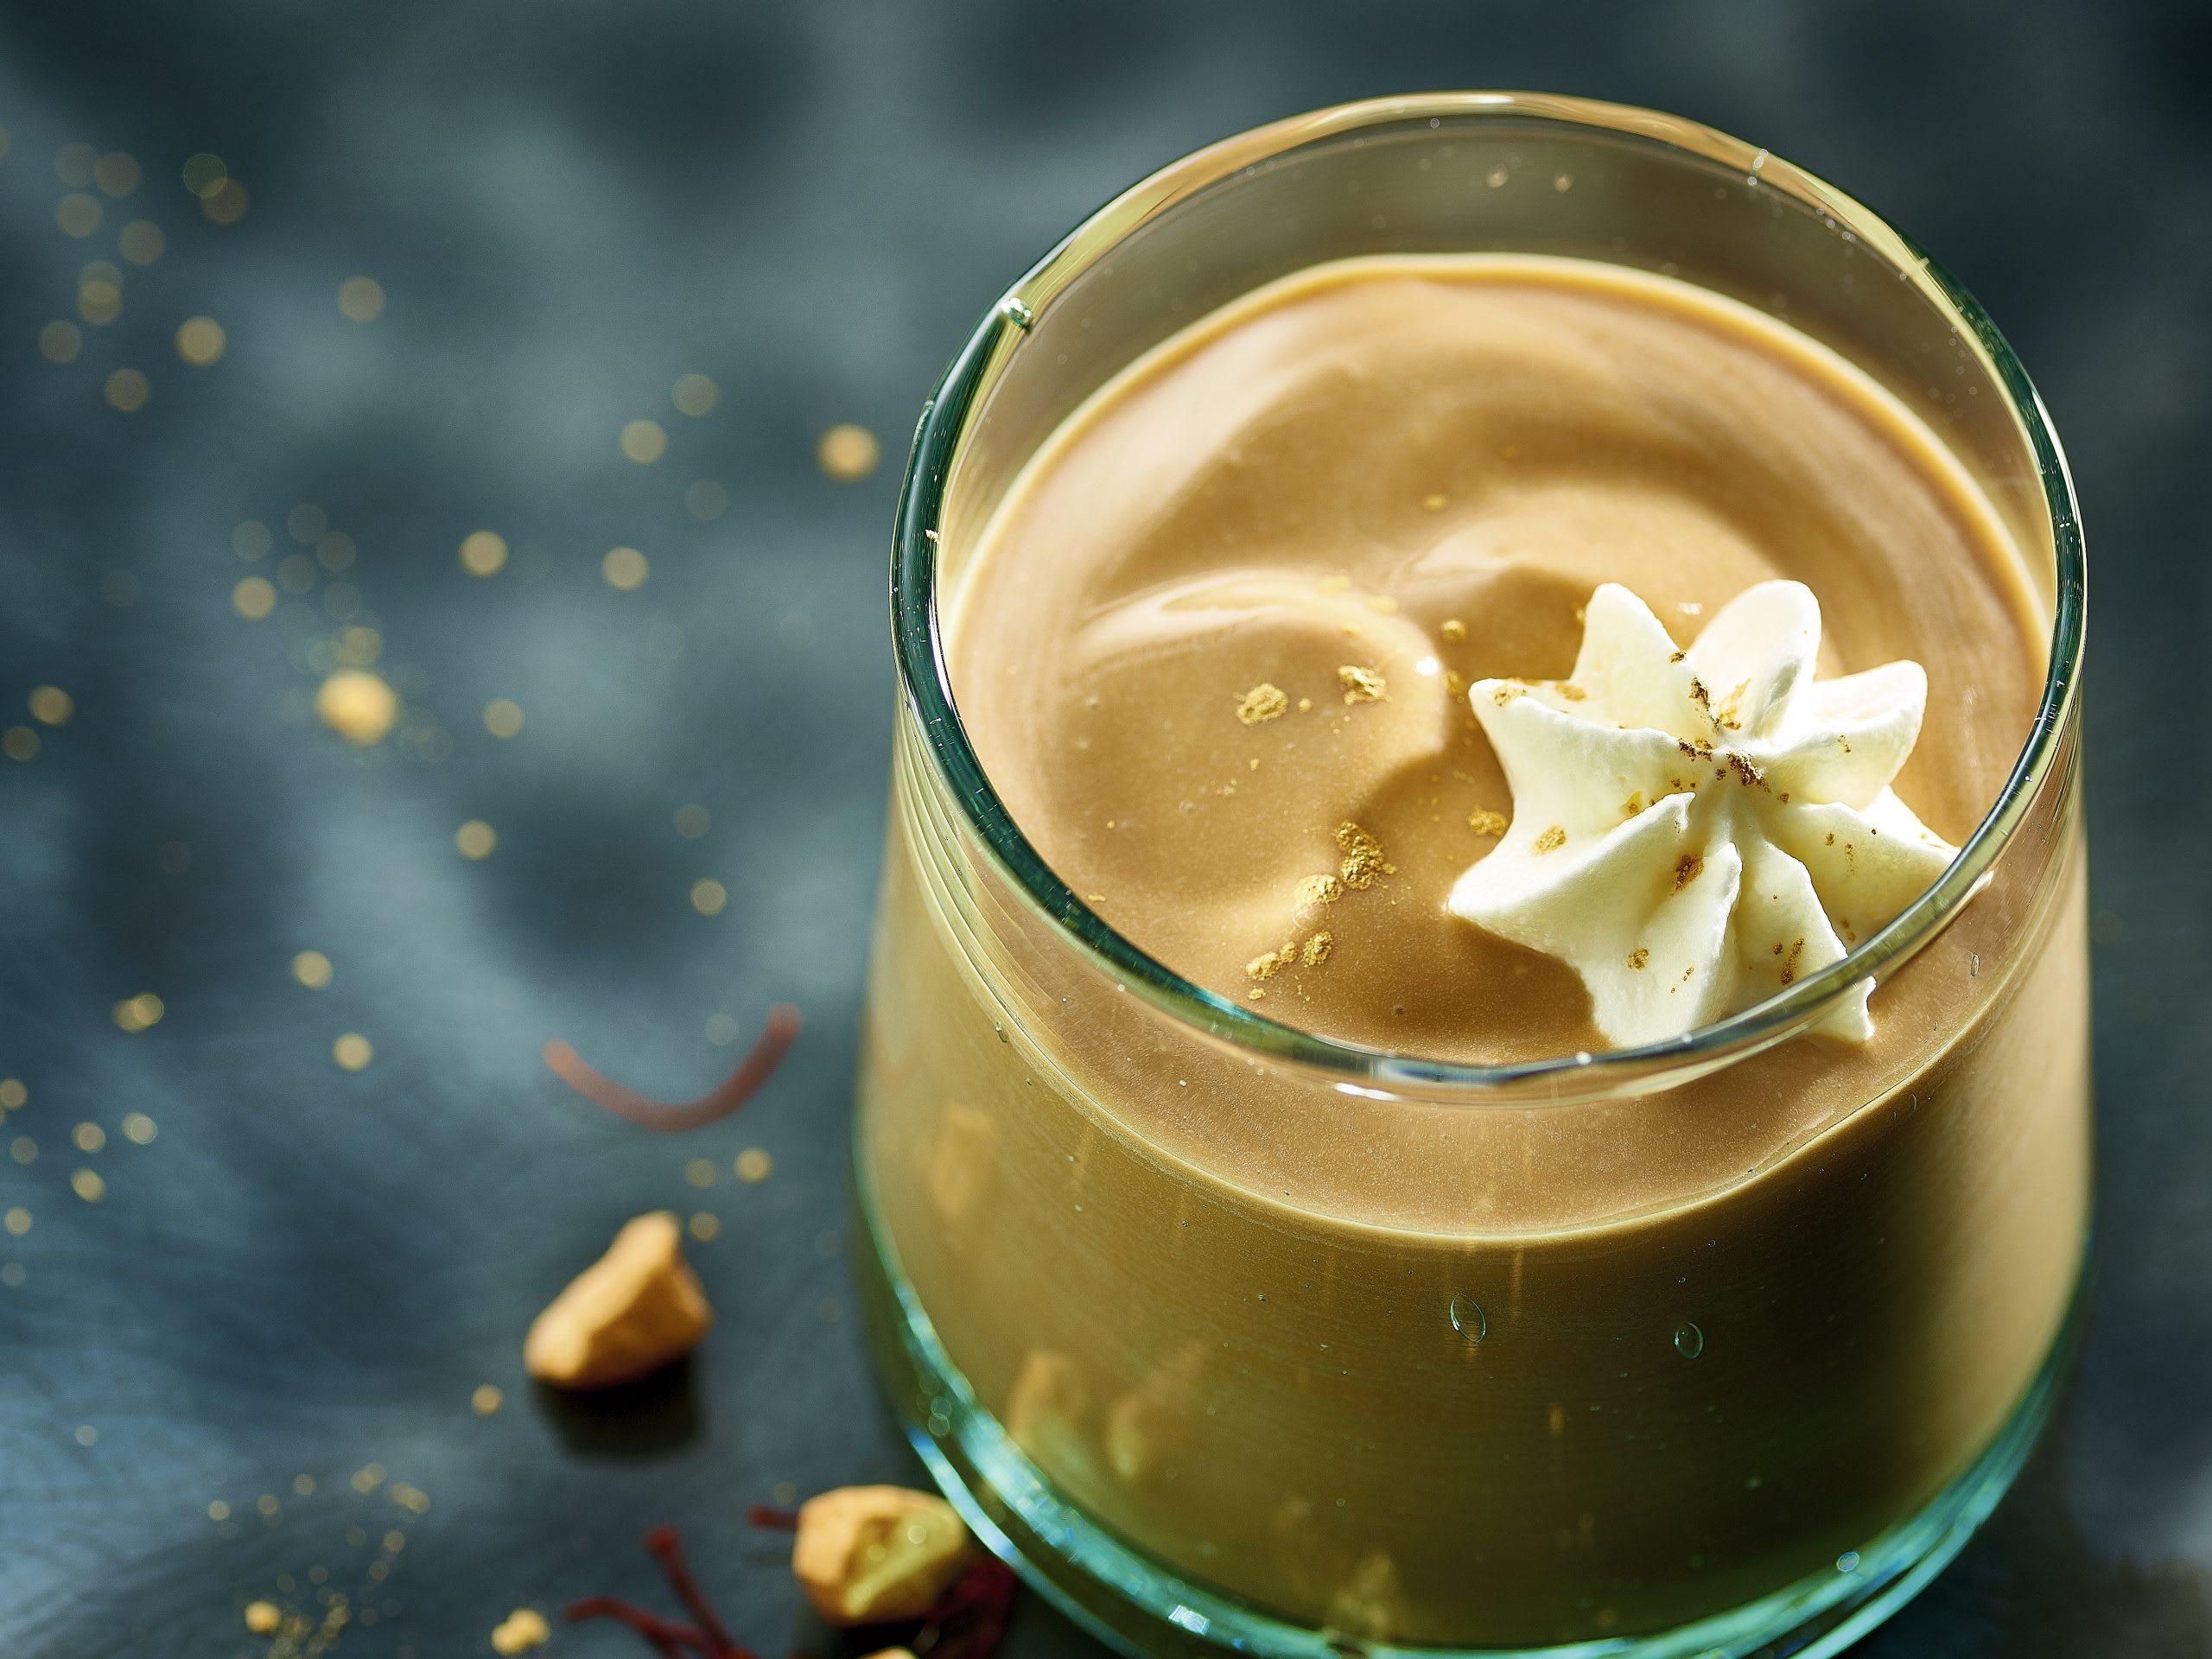 Crème safran-caramel